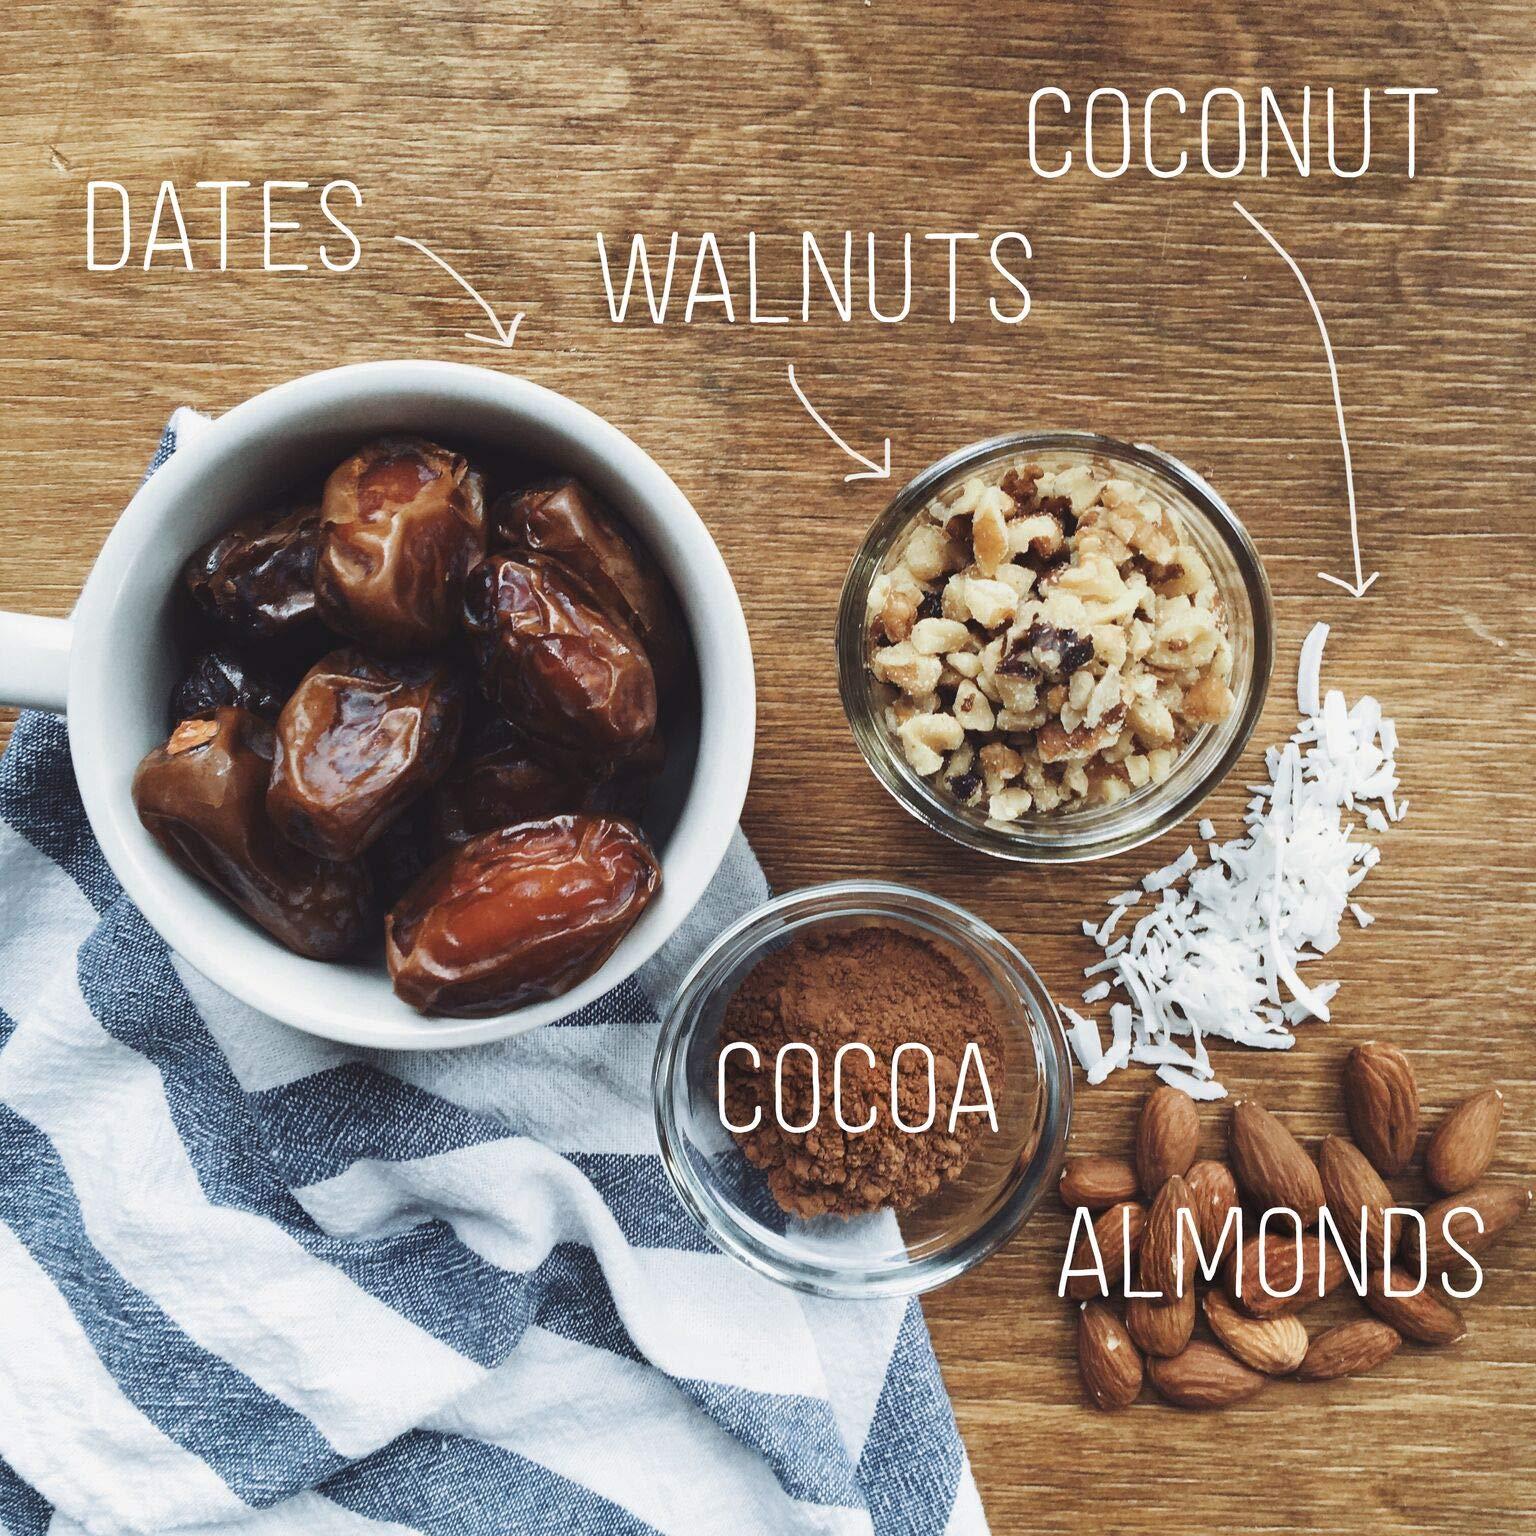 Larabar Gluten Free Bar, Chocolate Coconut Chew, 1.6 oz Bars (16 Count), Whole Food Gluten Free Bars, Dairy Free Snacks by LÄRABAR (Image #3)